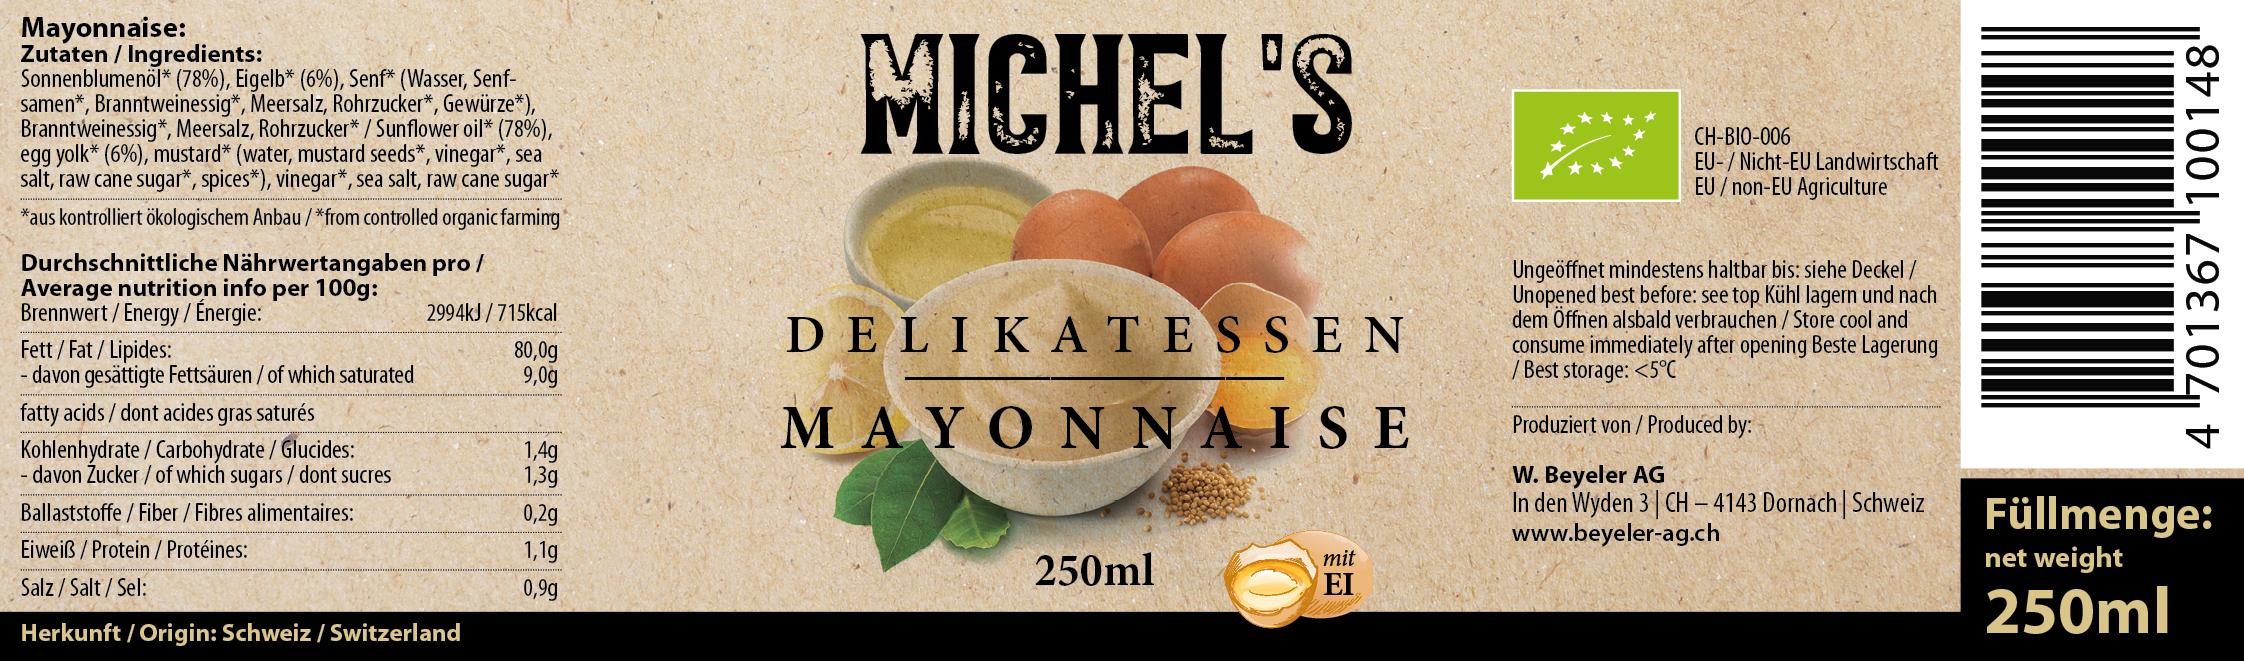 02900218_Michels_Logo_Design_Packaging_Mayonnaise.jpg